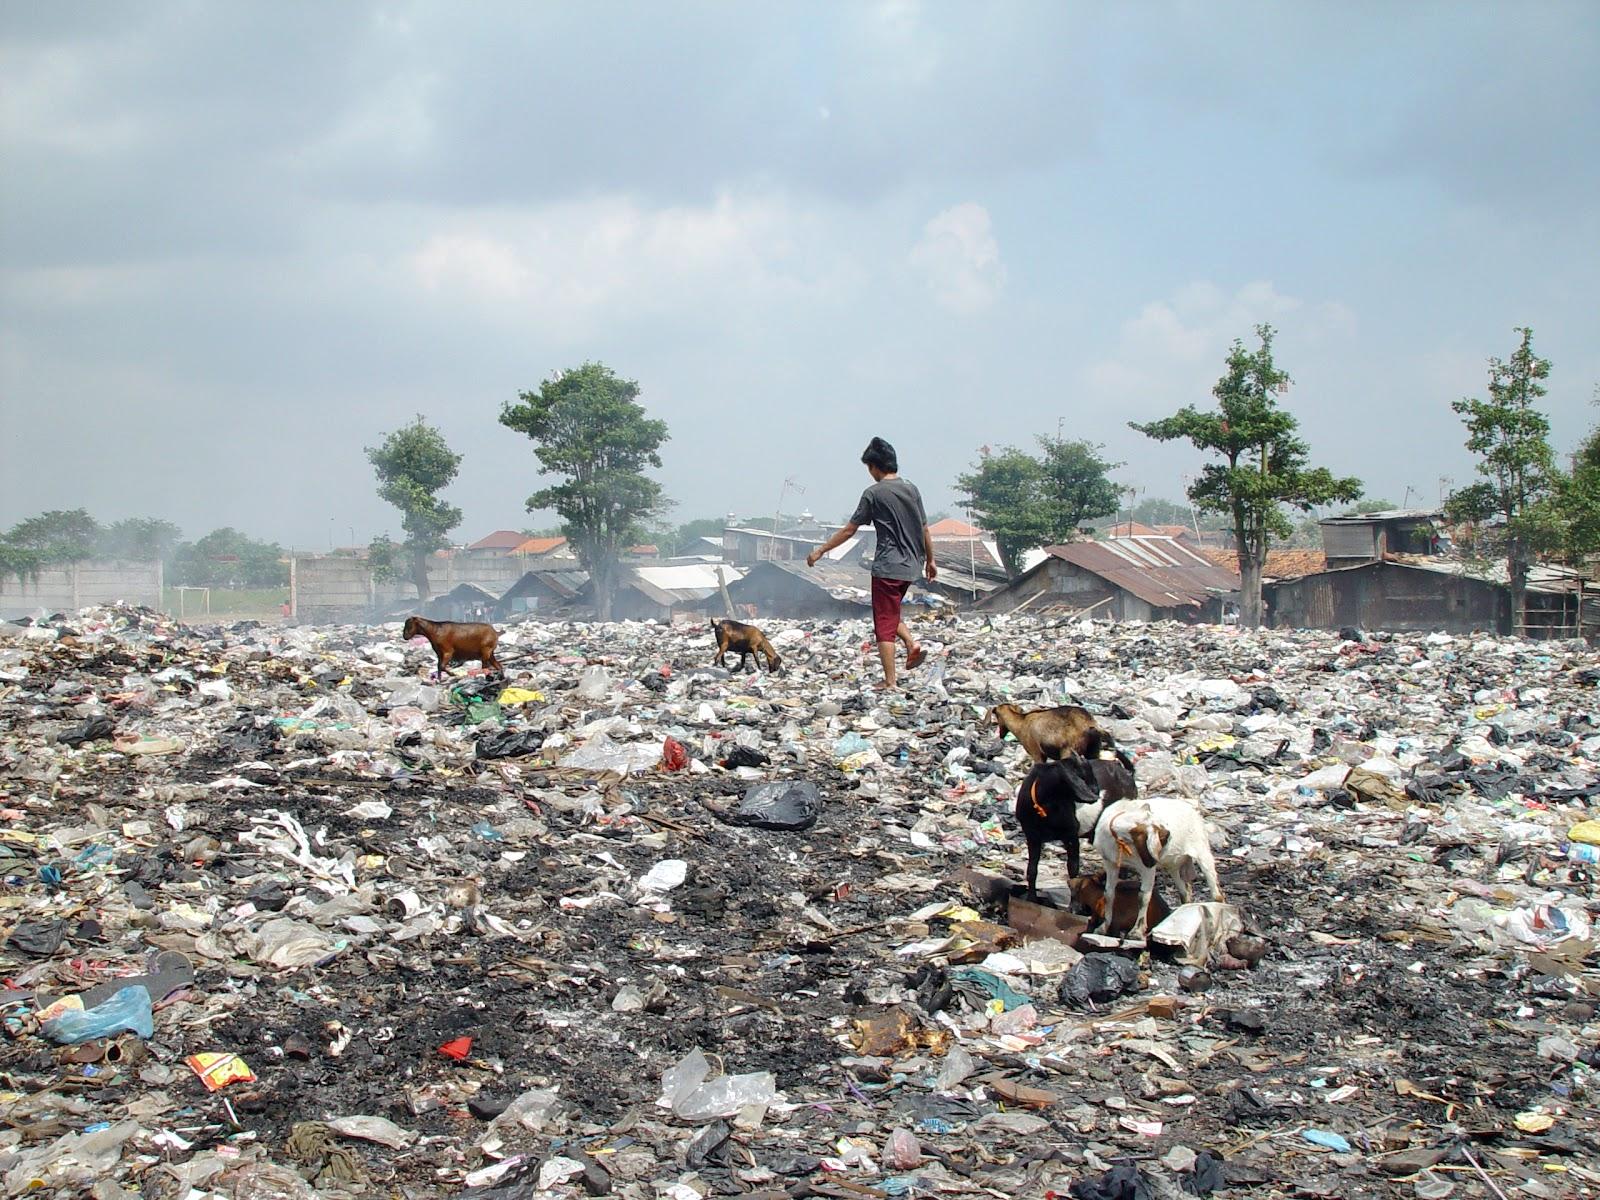 https://upload.wikimedia.org/wikipedia/commons/0/00/Jakarta_slumlife71.JPG